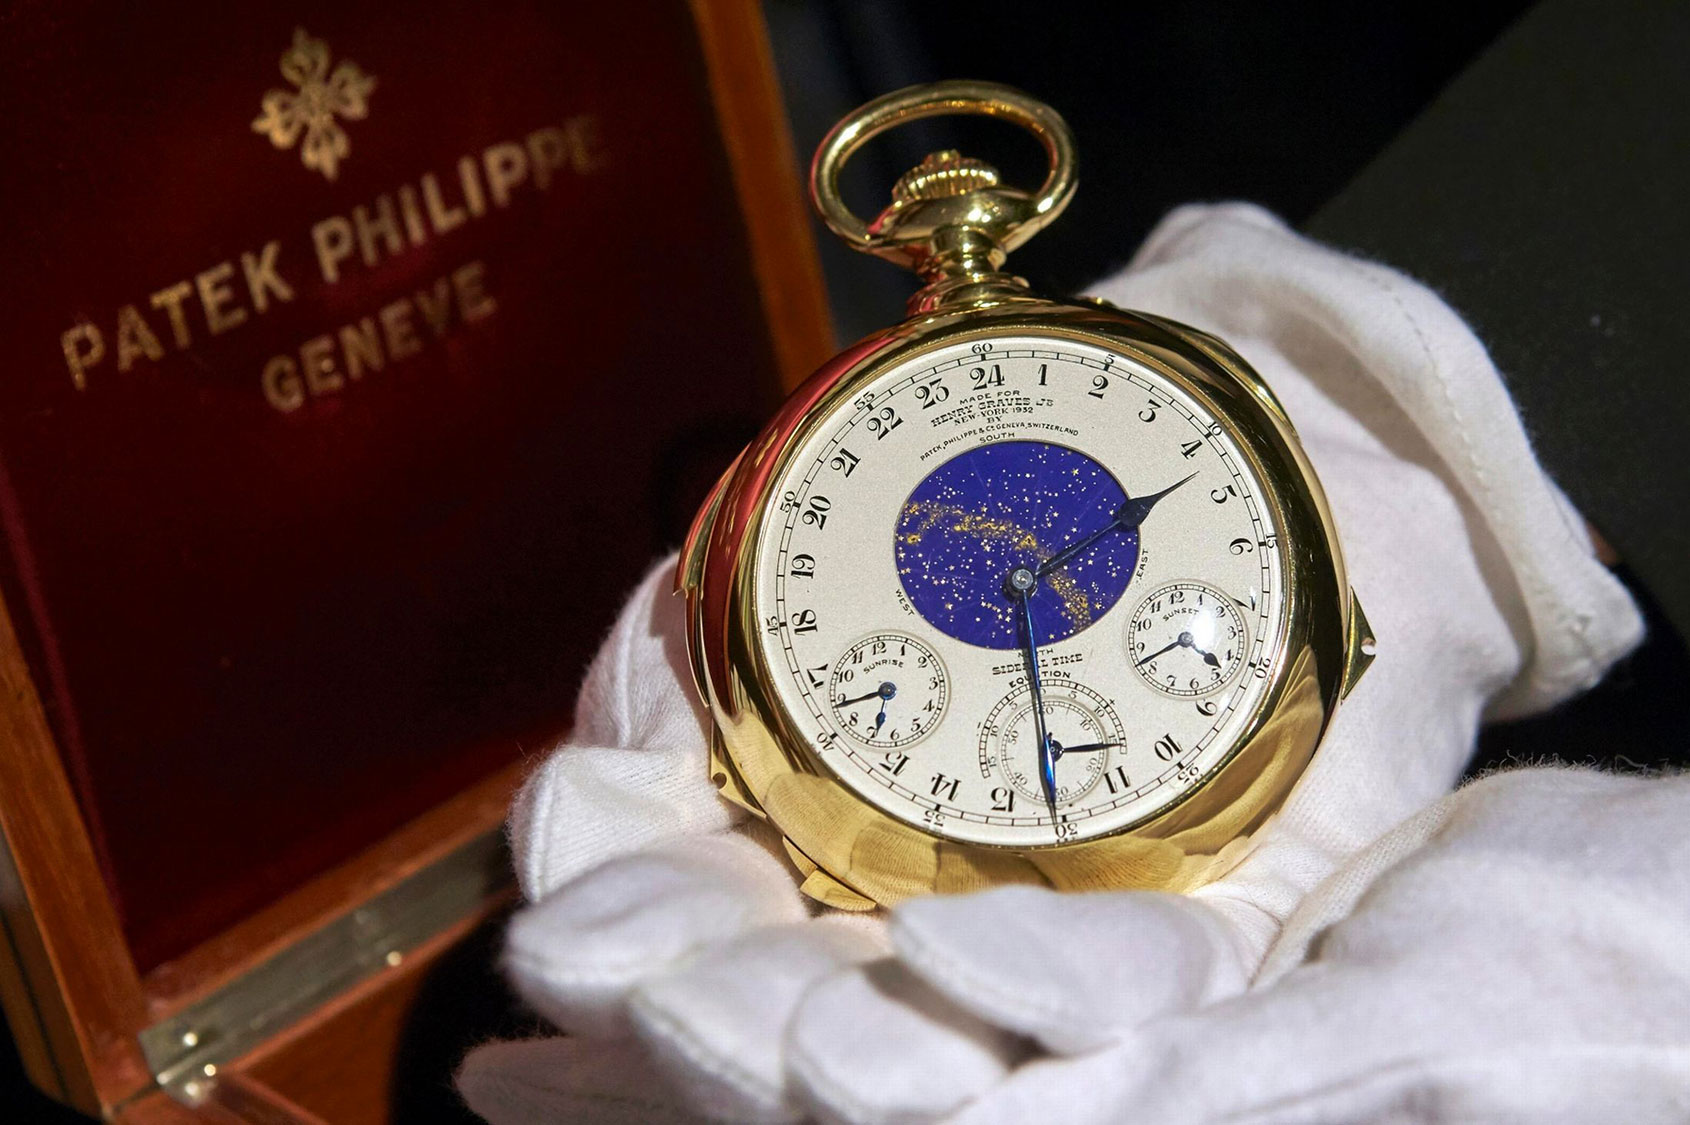 henry jnr patek philippe supercomplication sells